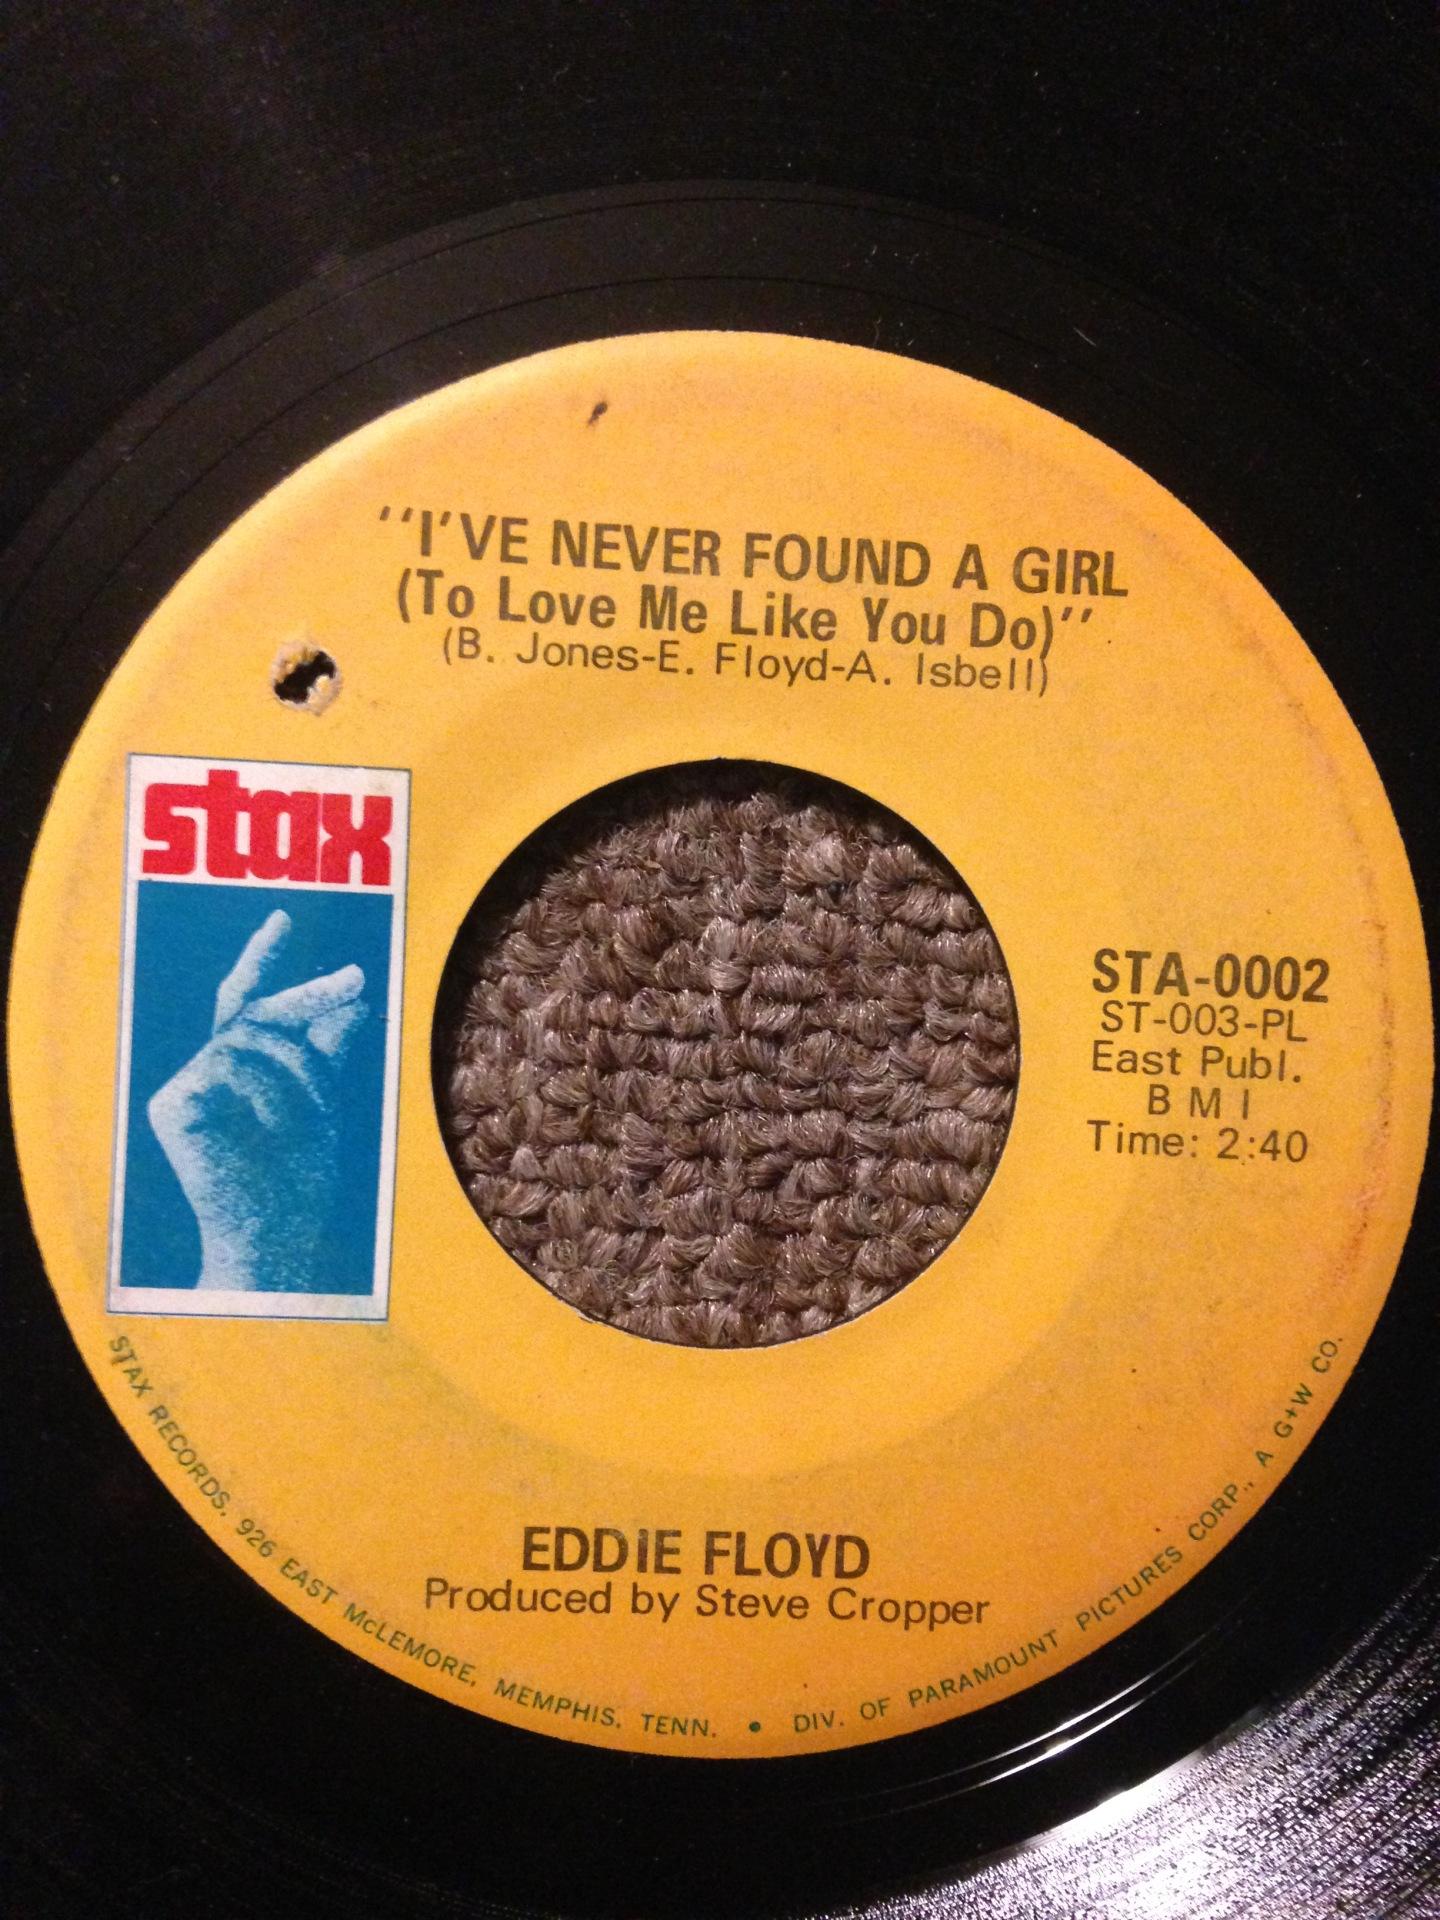 Eddie Floyd - I've Never Found A Girl (To Love Me Like You Do)